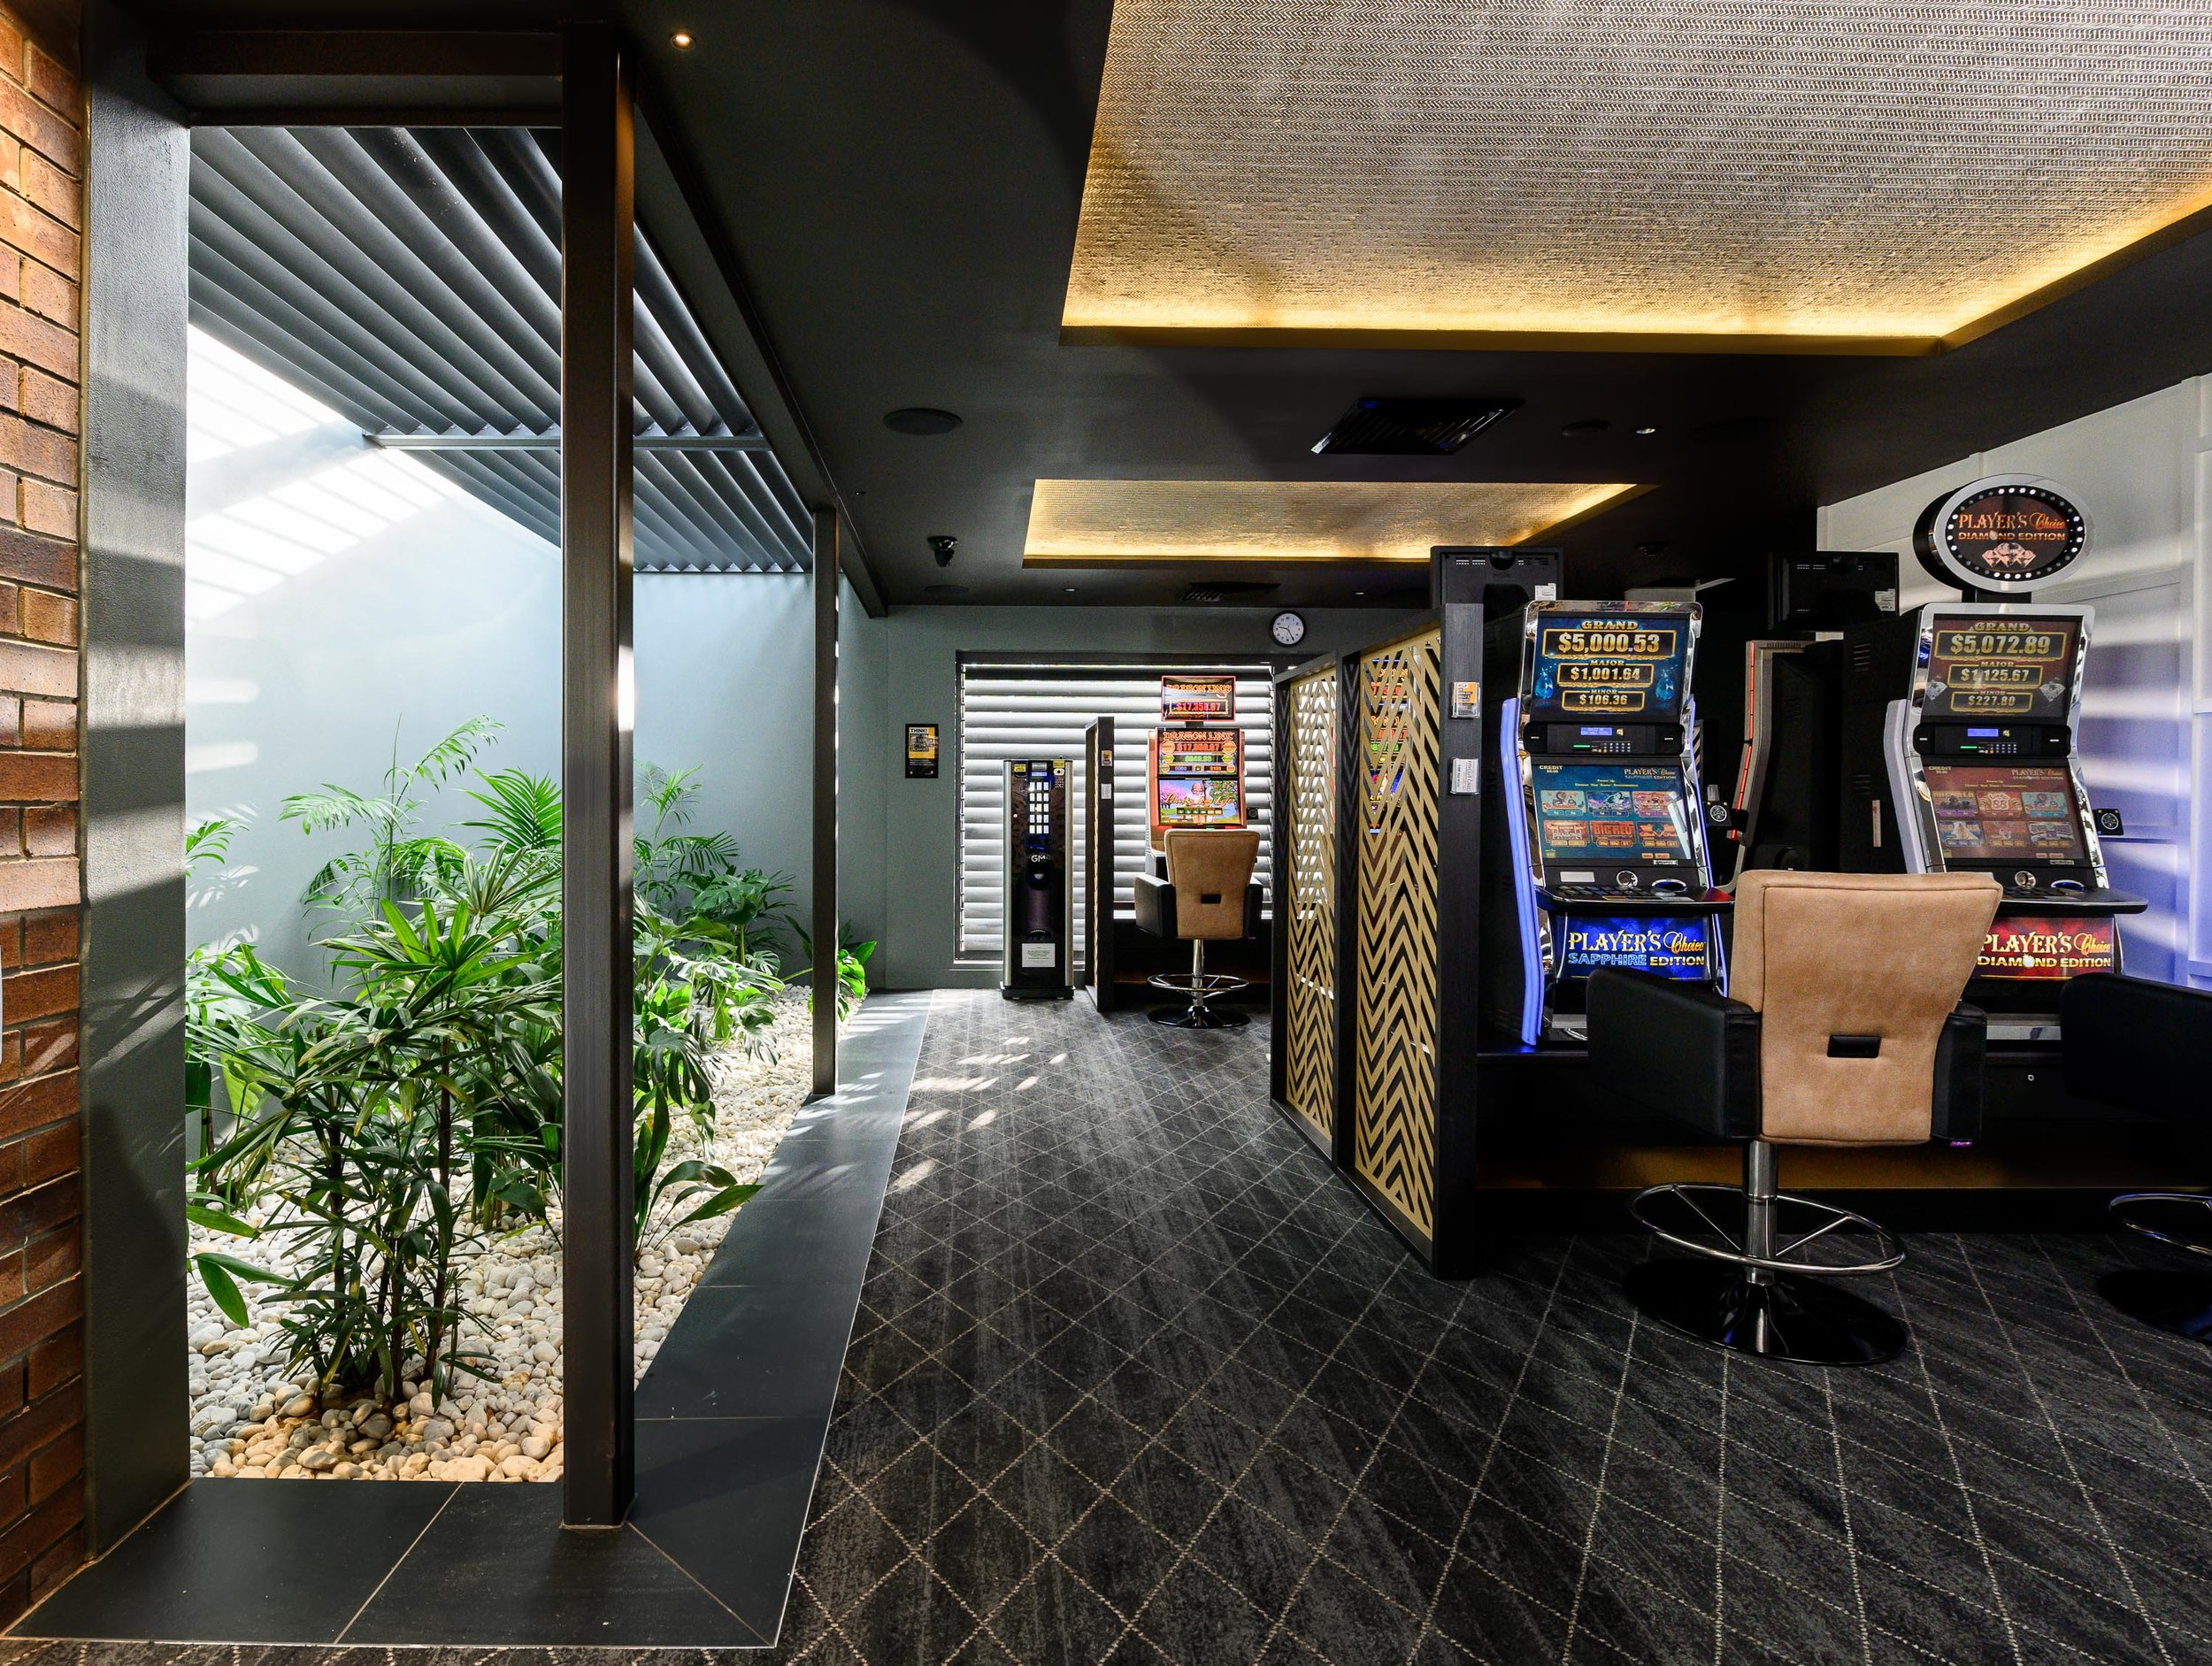 FabriArchitecture_TheTownhallHotel_Newcastle_NSW_CREDIT_DominicLoneragan_030719_0160.jpg